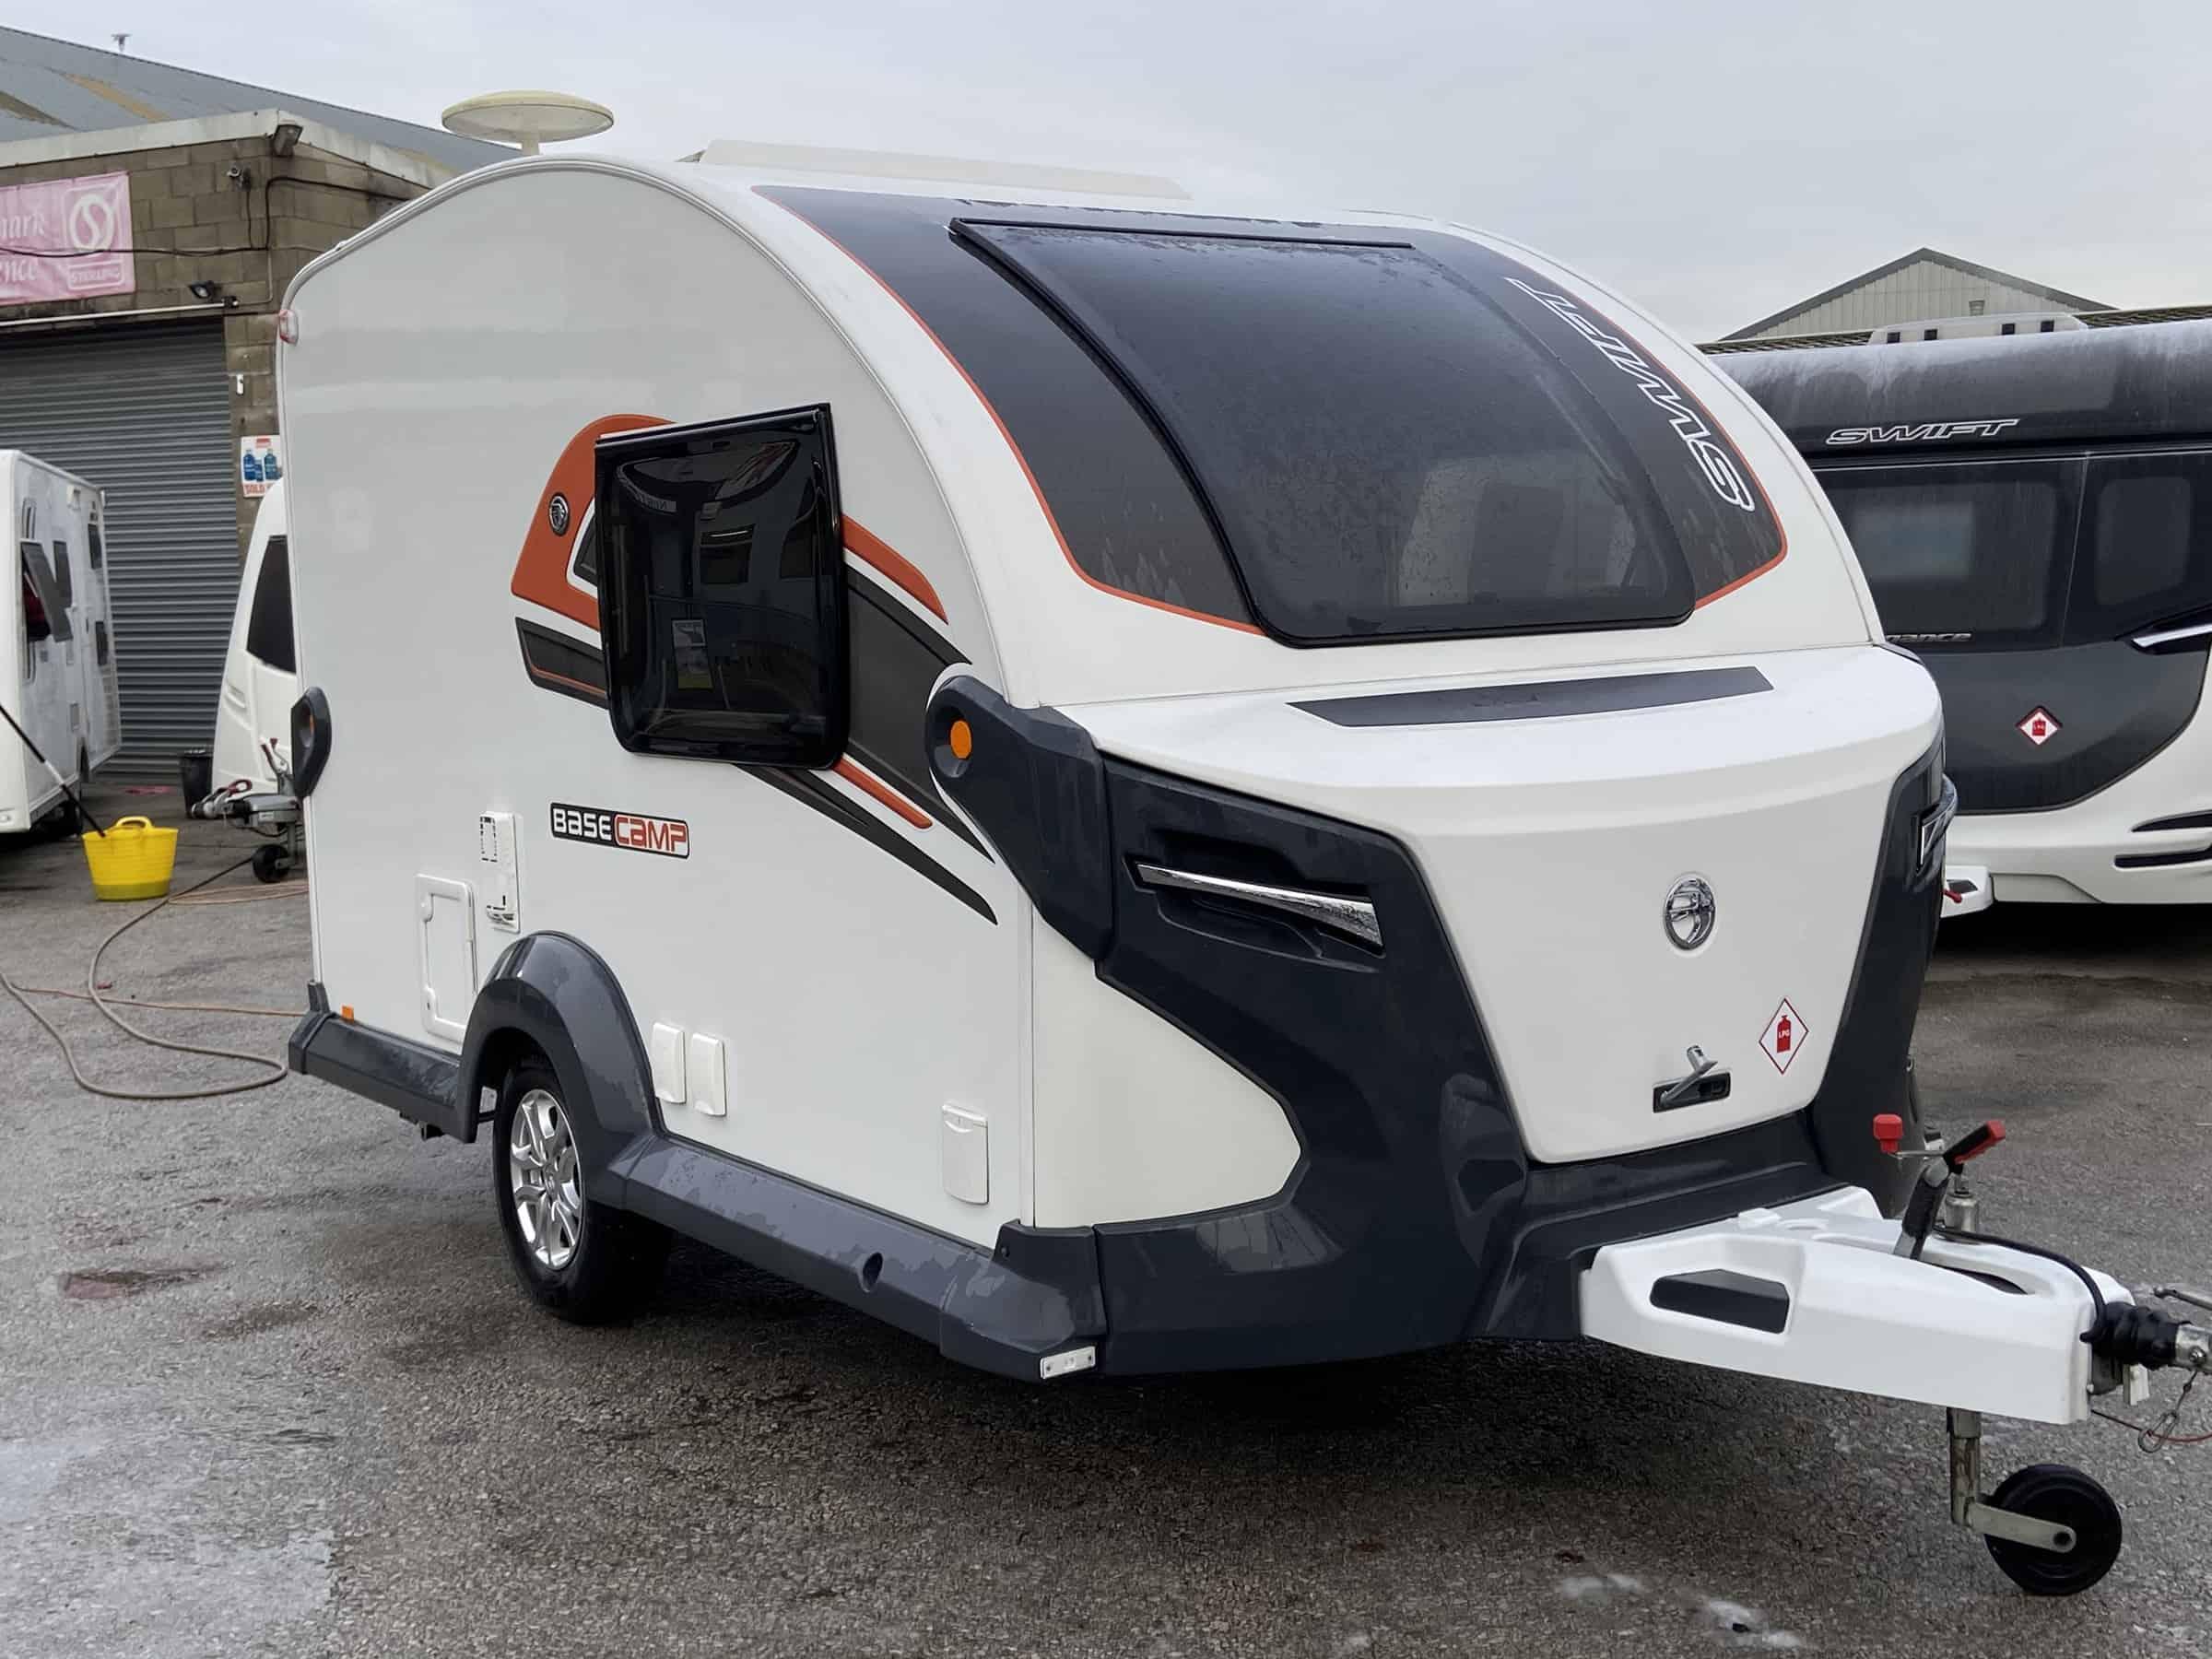 Swift Basecamp Plus | North Western Caravans